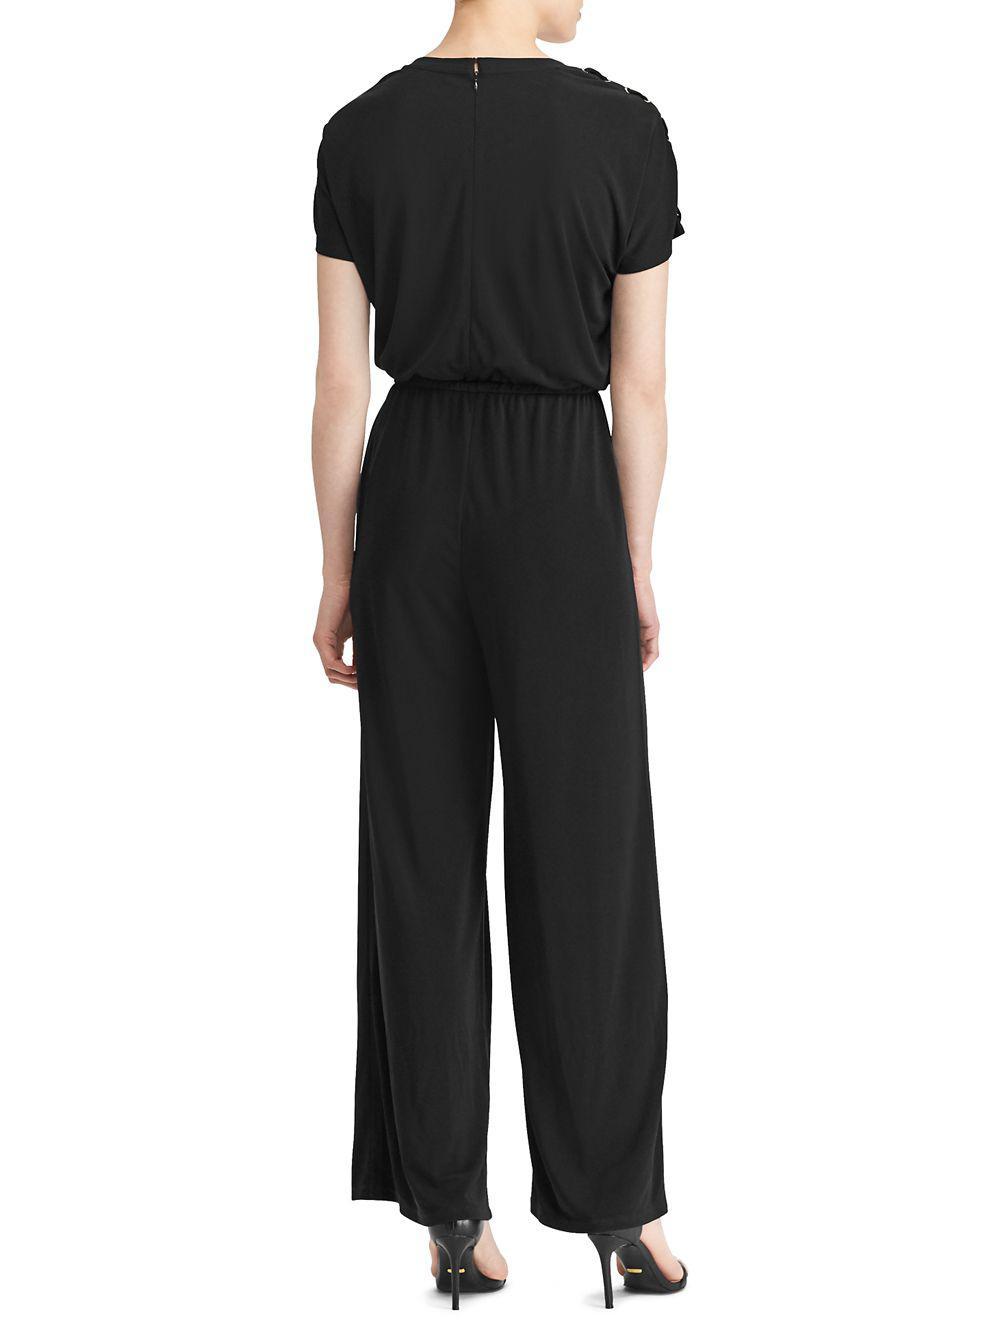 694f131e691 Lauren by Ralph Lauren - Black Petite Petite Jersey Wide-leg Jumpsuit - Lyst.  View fullscreen